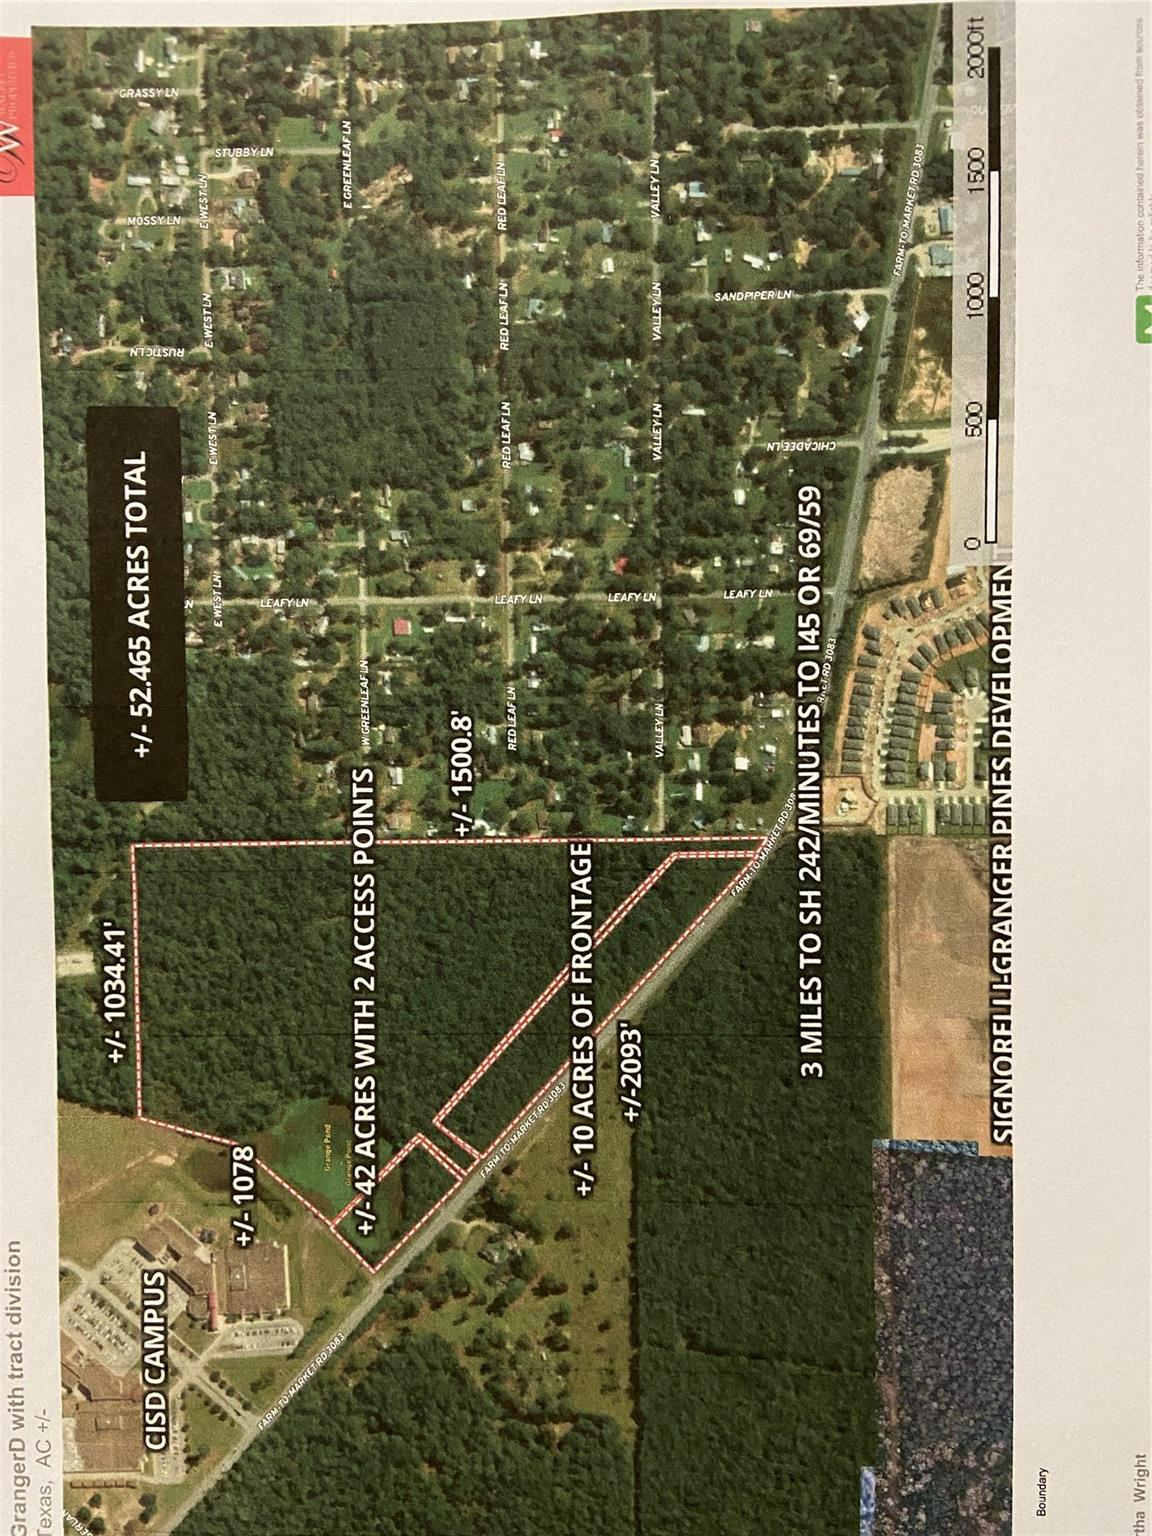 001 FM 3083 Property Photo - Conroe, TX real estate listing